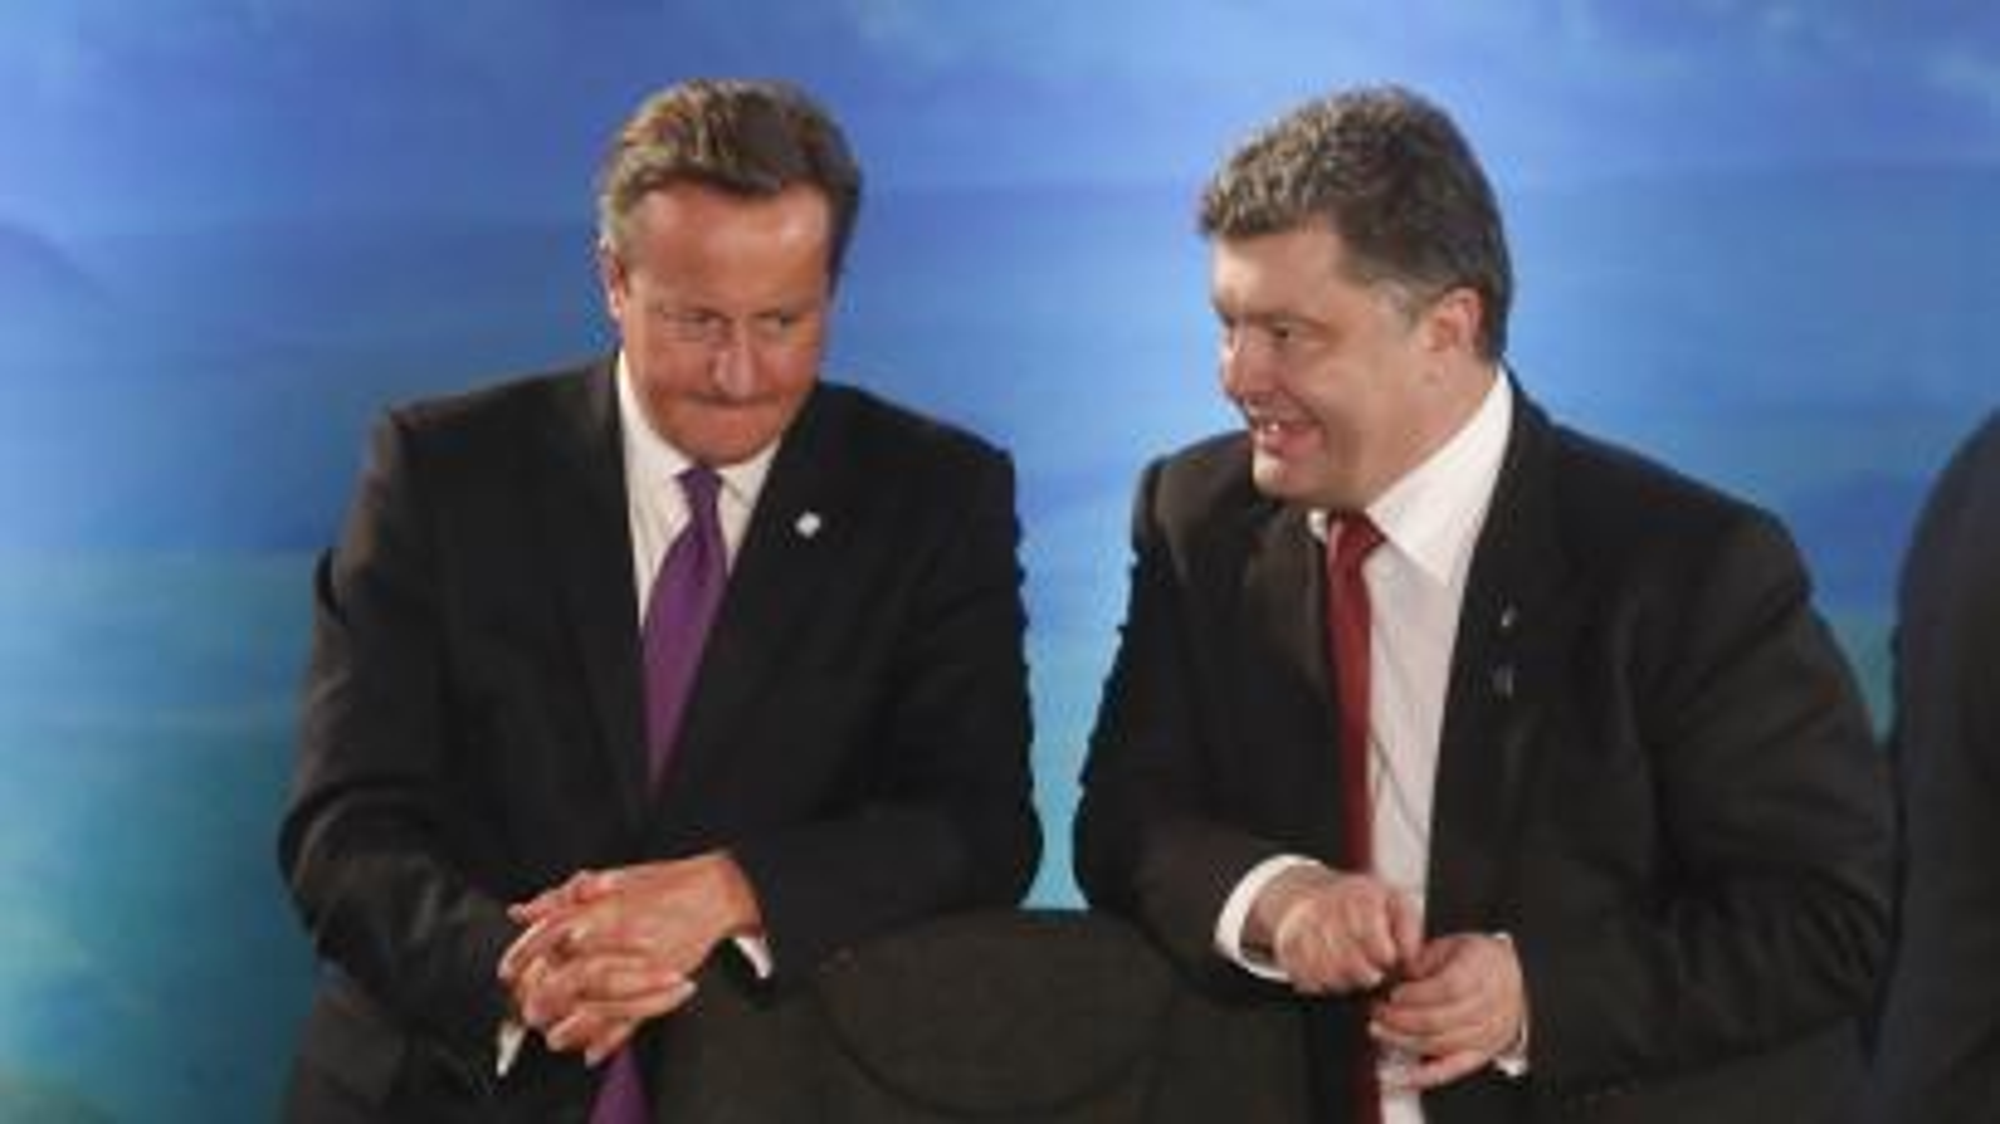 2014Britain's Prime Minister David Cameron talks with Ukraine's President Petro Poroshenko during the NATO Summit at the Celtic Manor Resort in Newport, Wales, September 4, 2014.